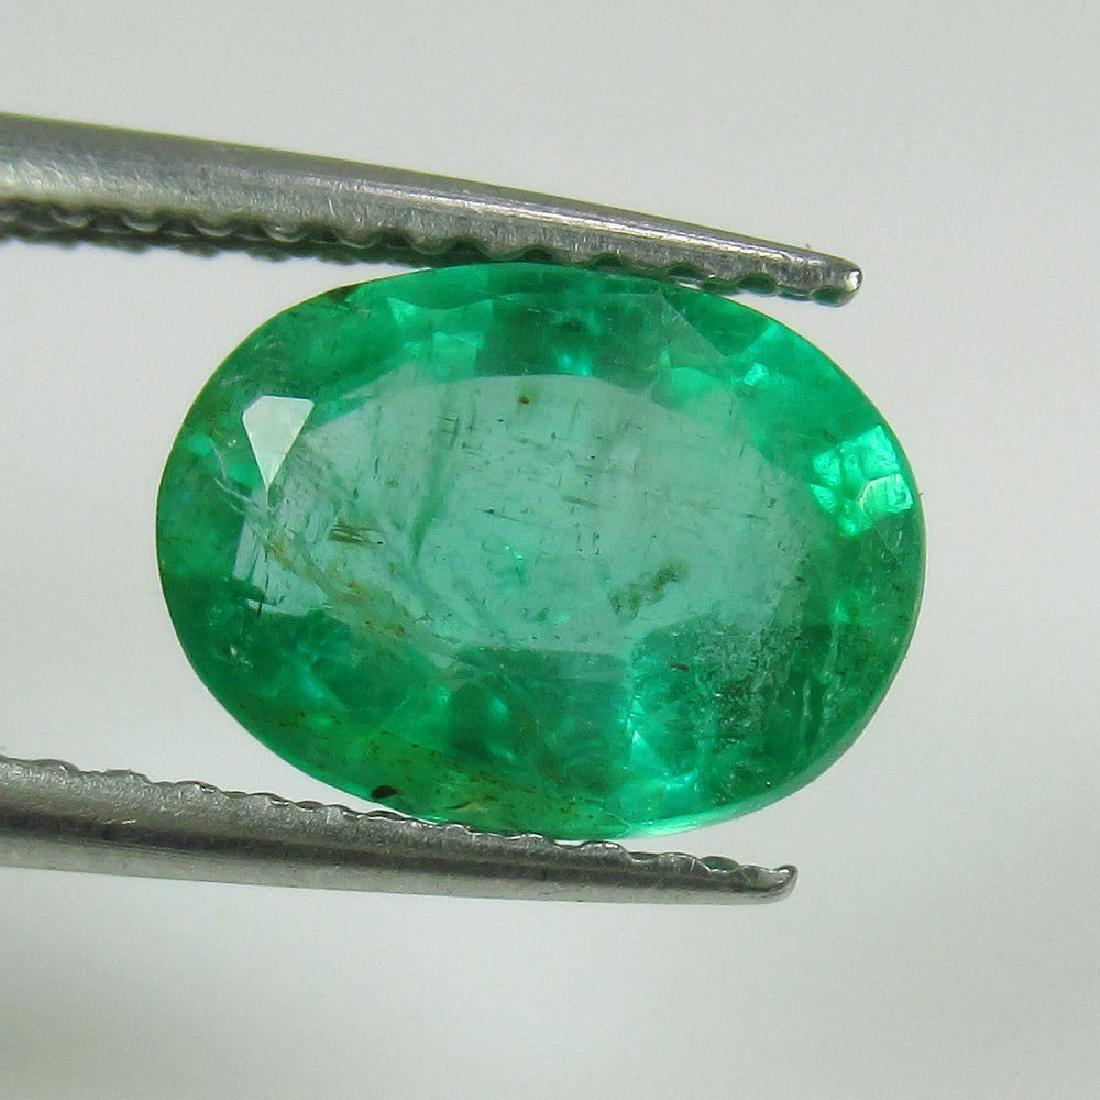 1.79 Ct Genuine Zambian Emerald Nice Oval Cut